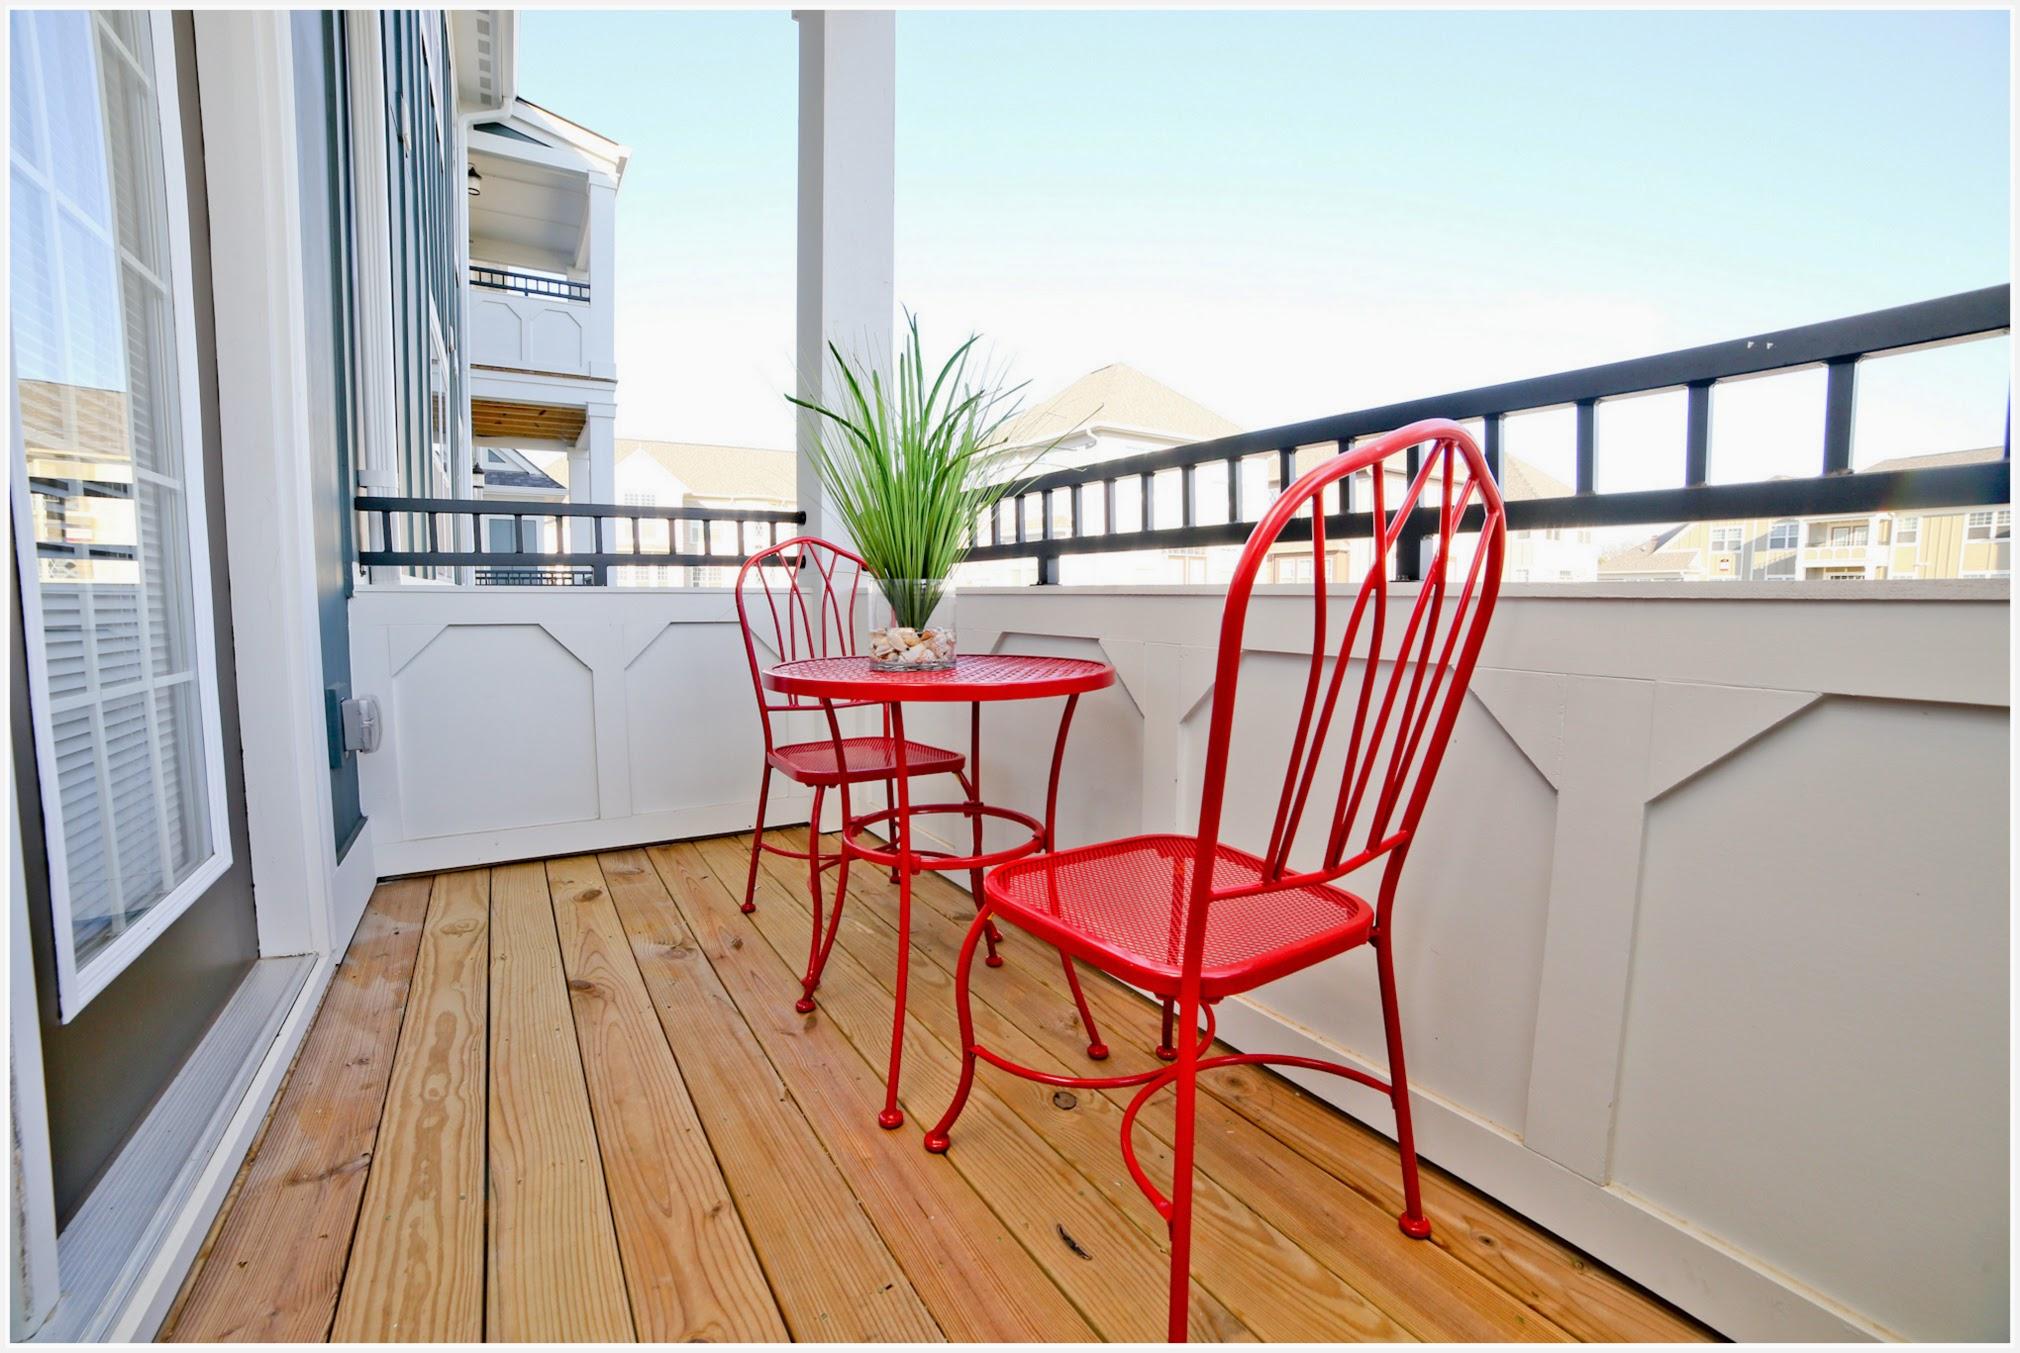 Hamilton - Model patio or balcony (apartment).jpg